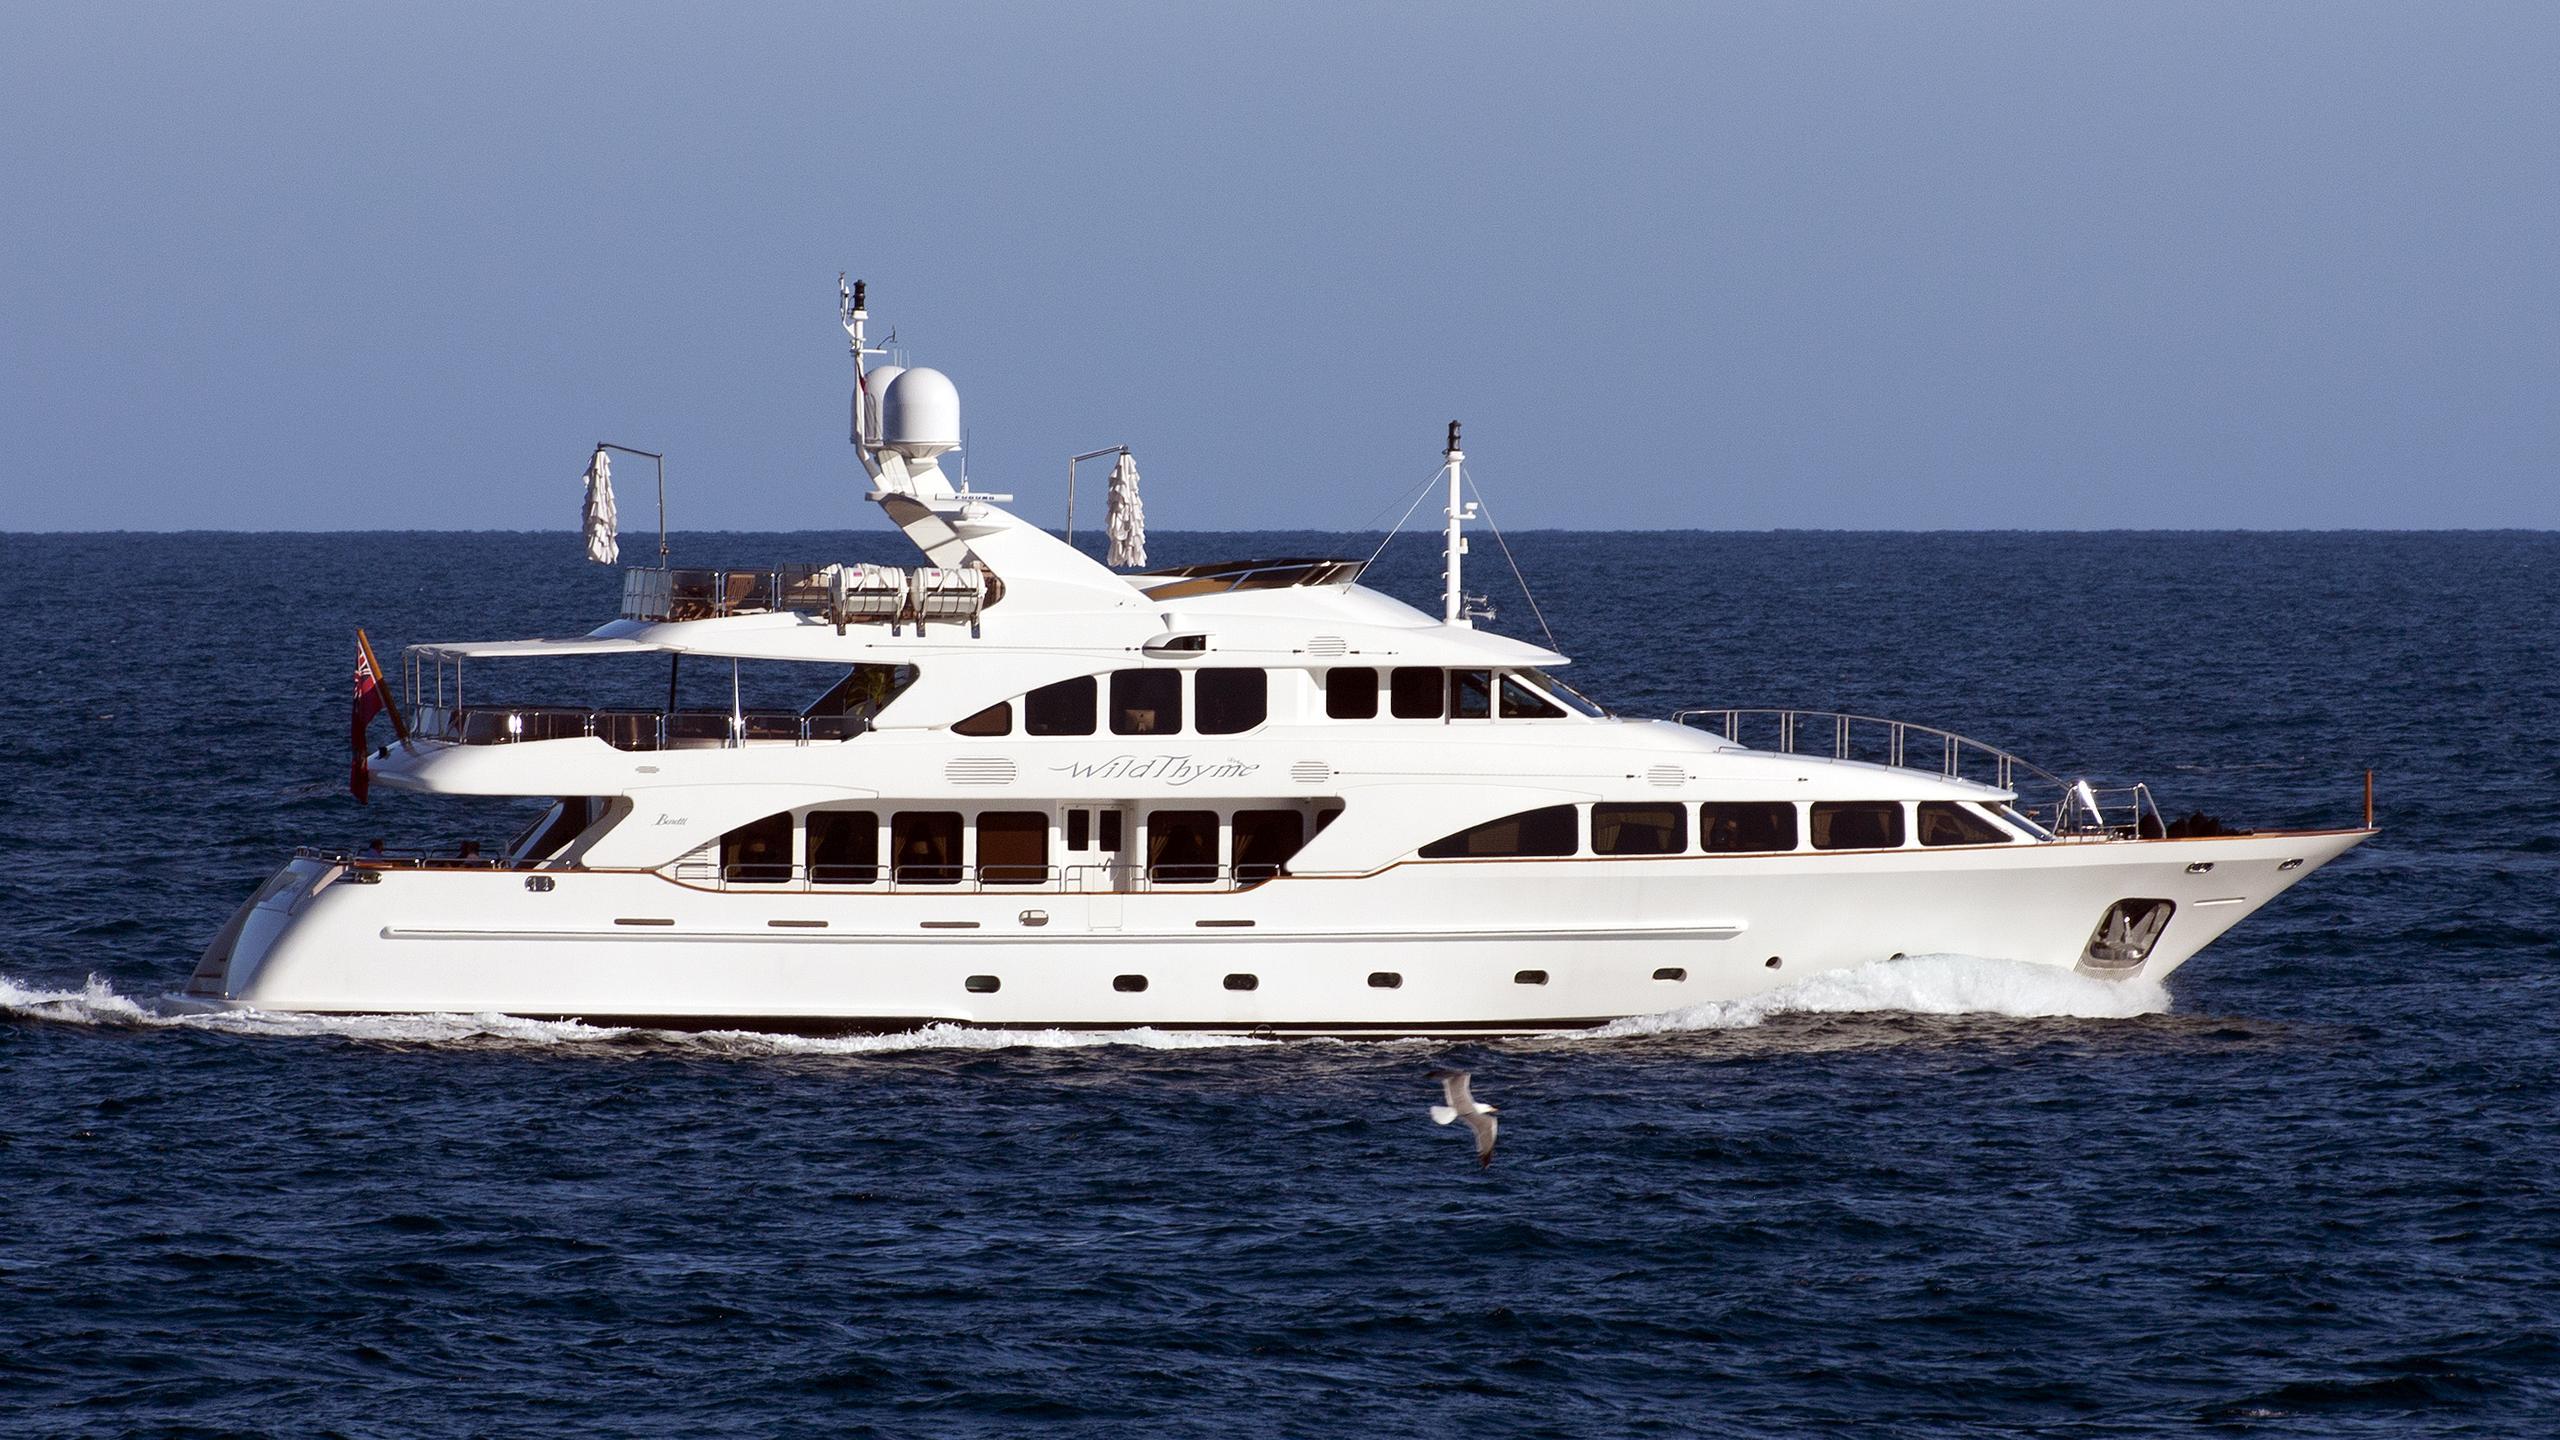 aura wild thyme motoryacht benetti 37m 2006 profile